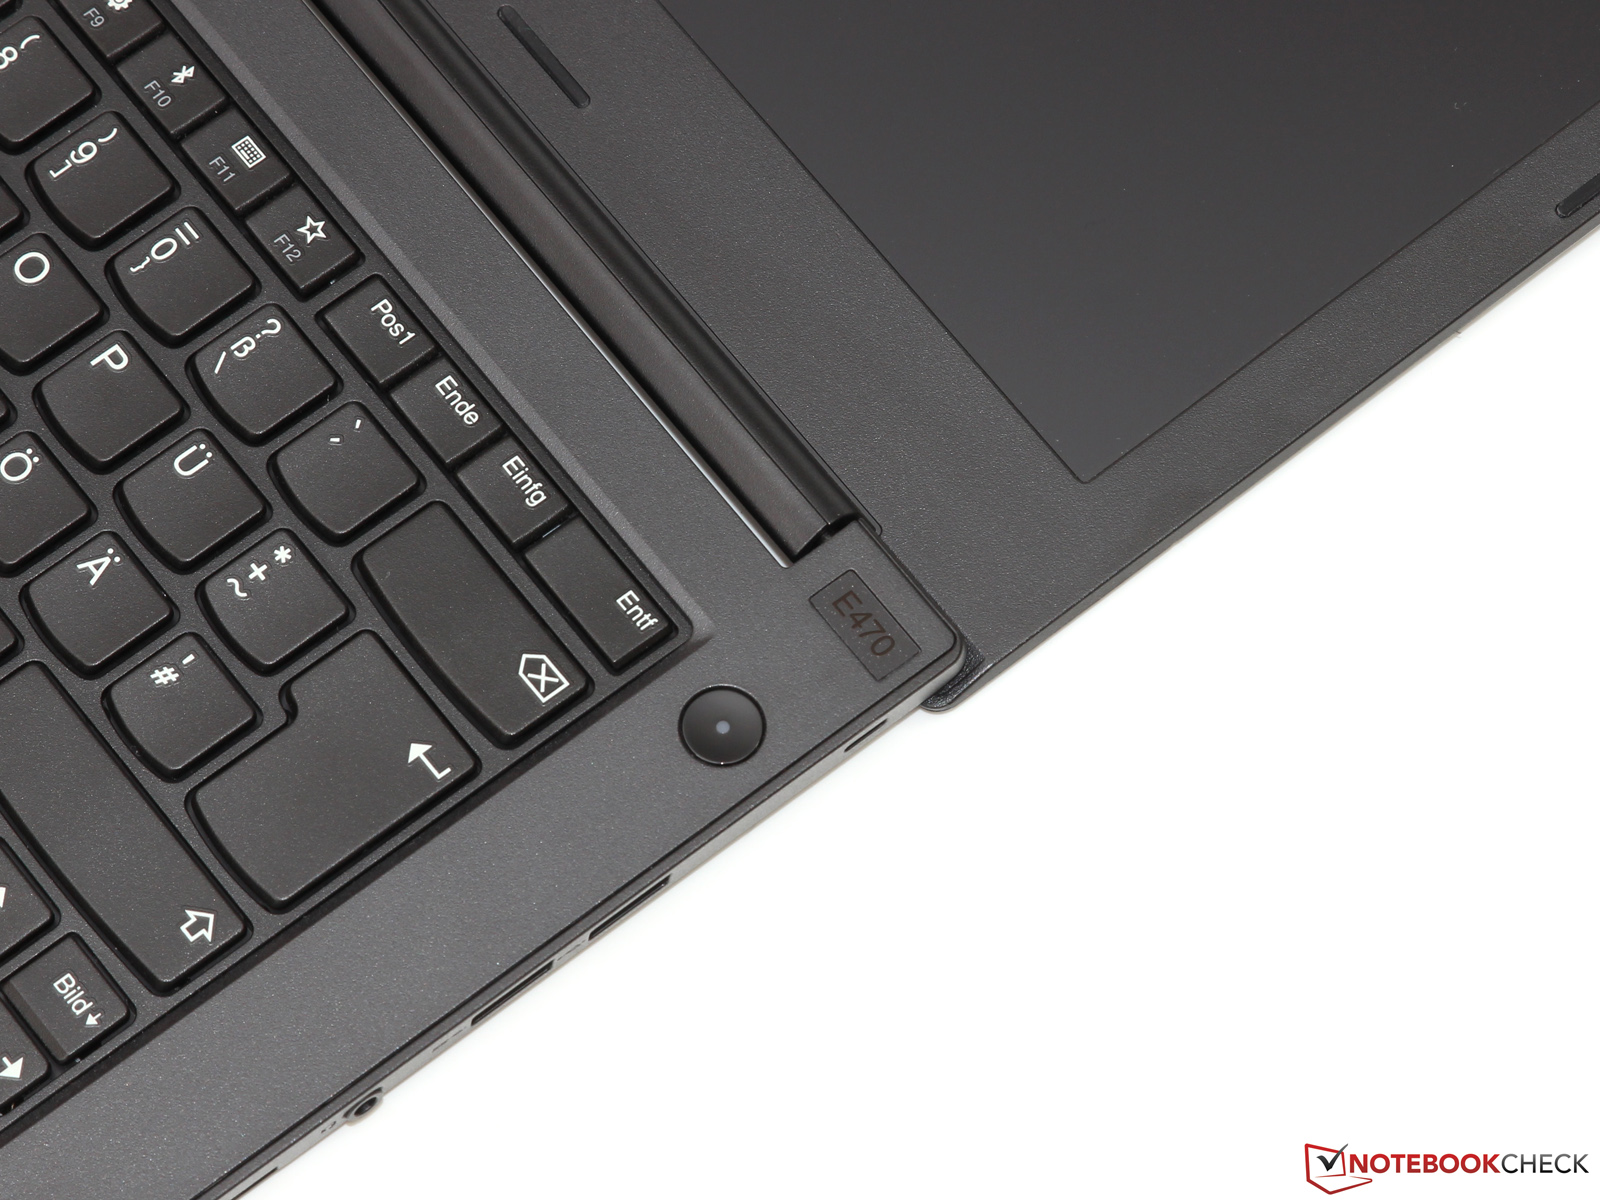 Lenovo ThinkPad E470 (Core i5, GeForce 940MX) Notebook